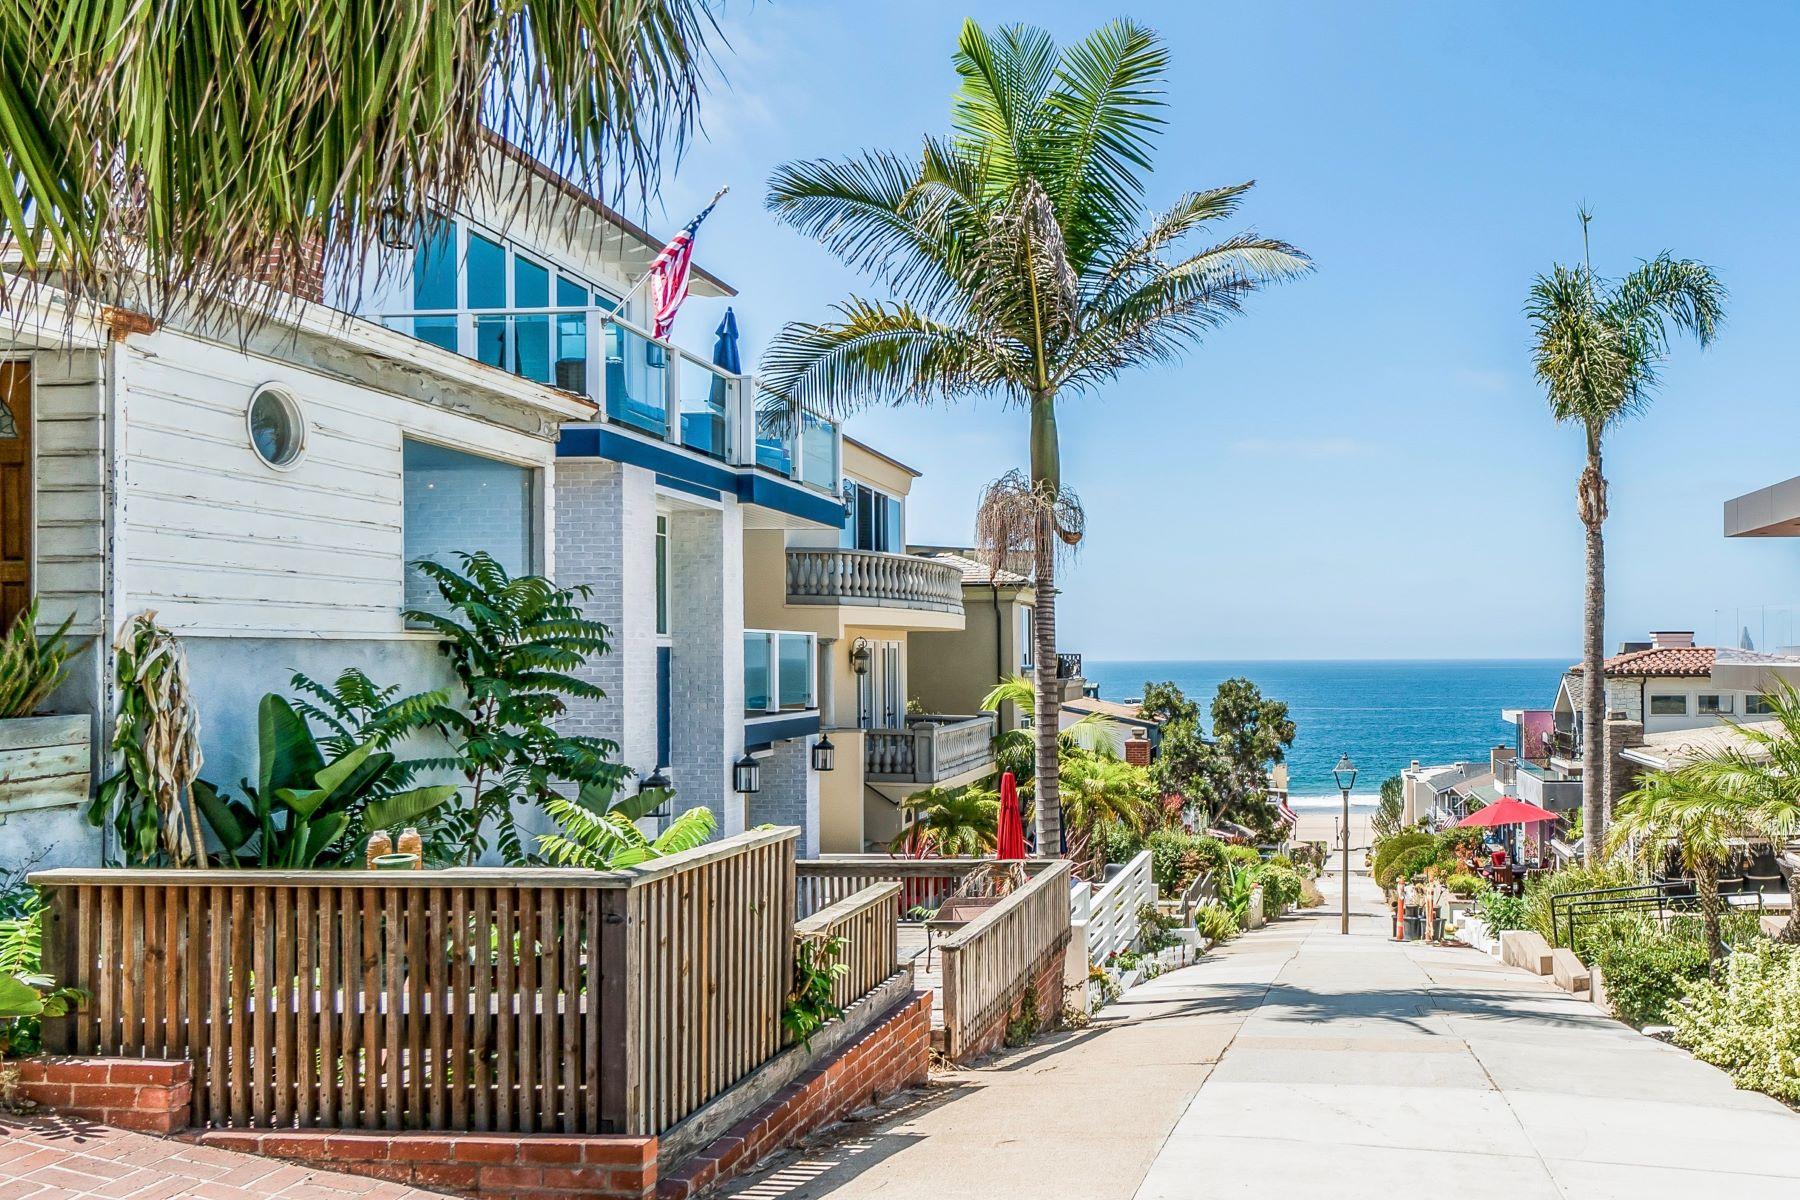 Duplex Homes 为 销售 在 228 19th Street, Manhattan Beach, CA 90266 228 19th Street 曼哈顿海滩, 加利福尼亚州 90266 美国